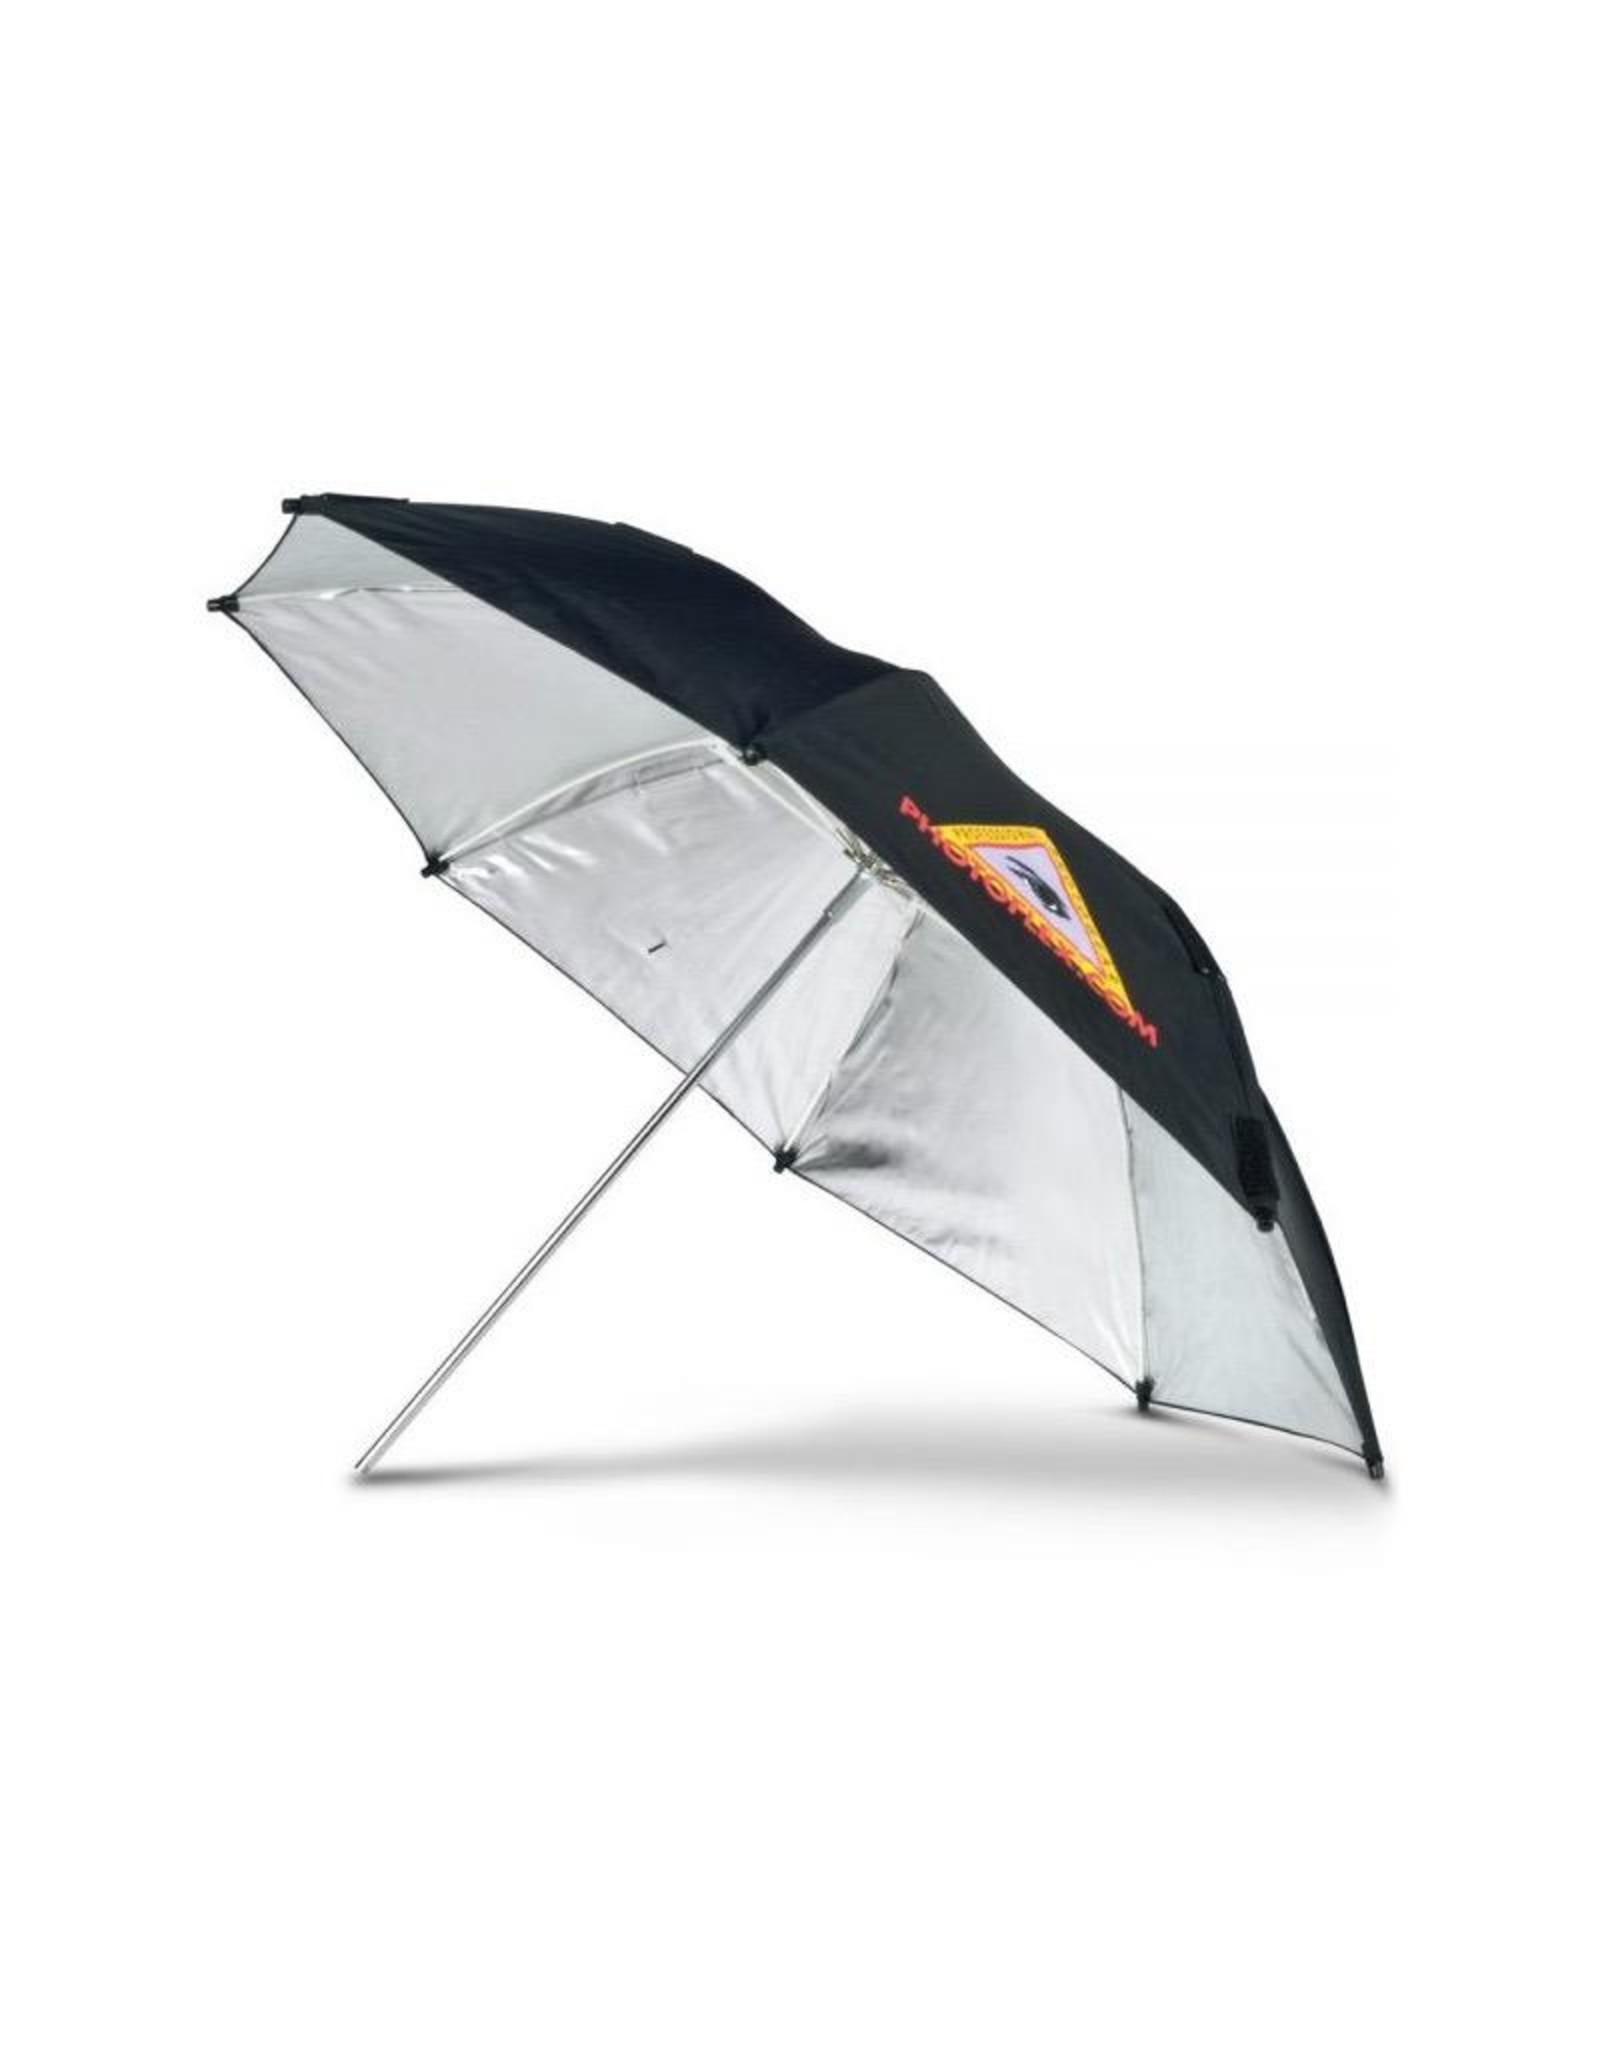 "Photoflex ADH 45"" Silver Adjustable Umbrella"